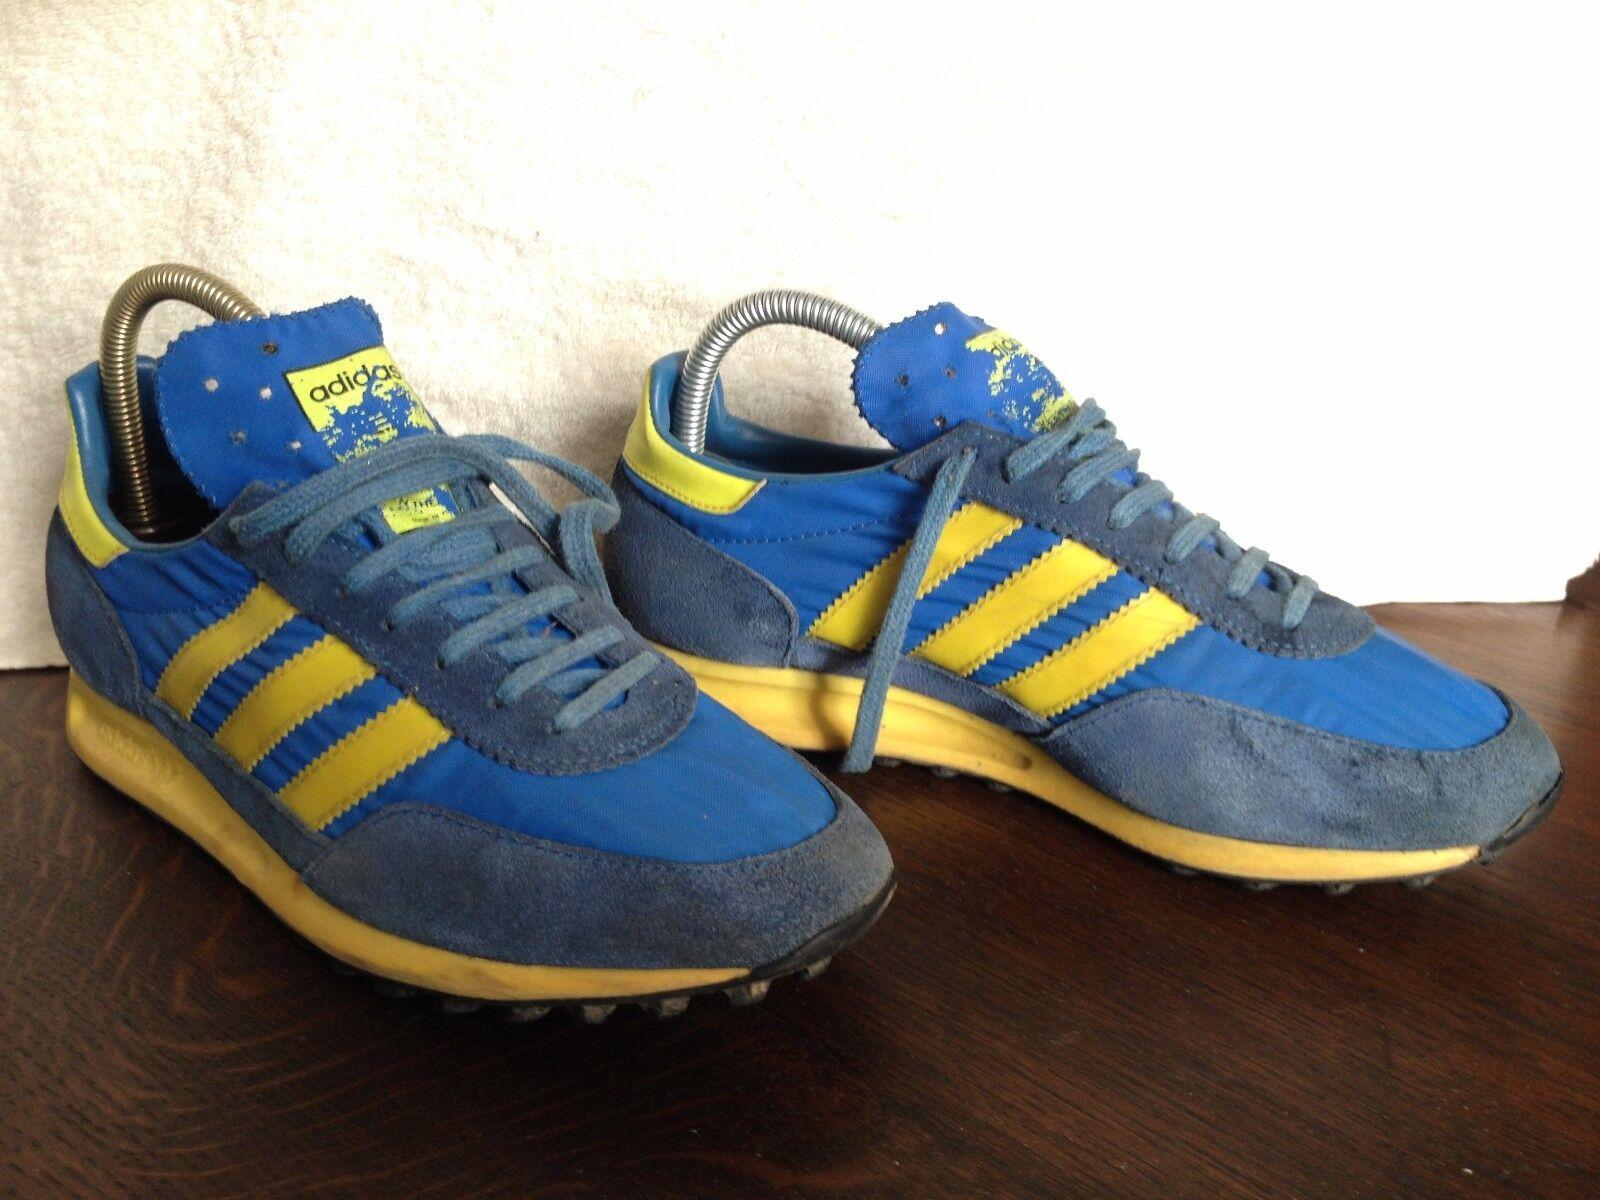 Adidas 7.5 Yezzy Boost Waverunner 700 Talla 41 1/3 Taille 7.5 Adidas 8c6882